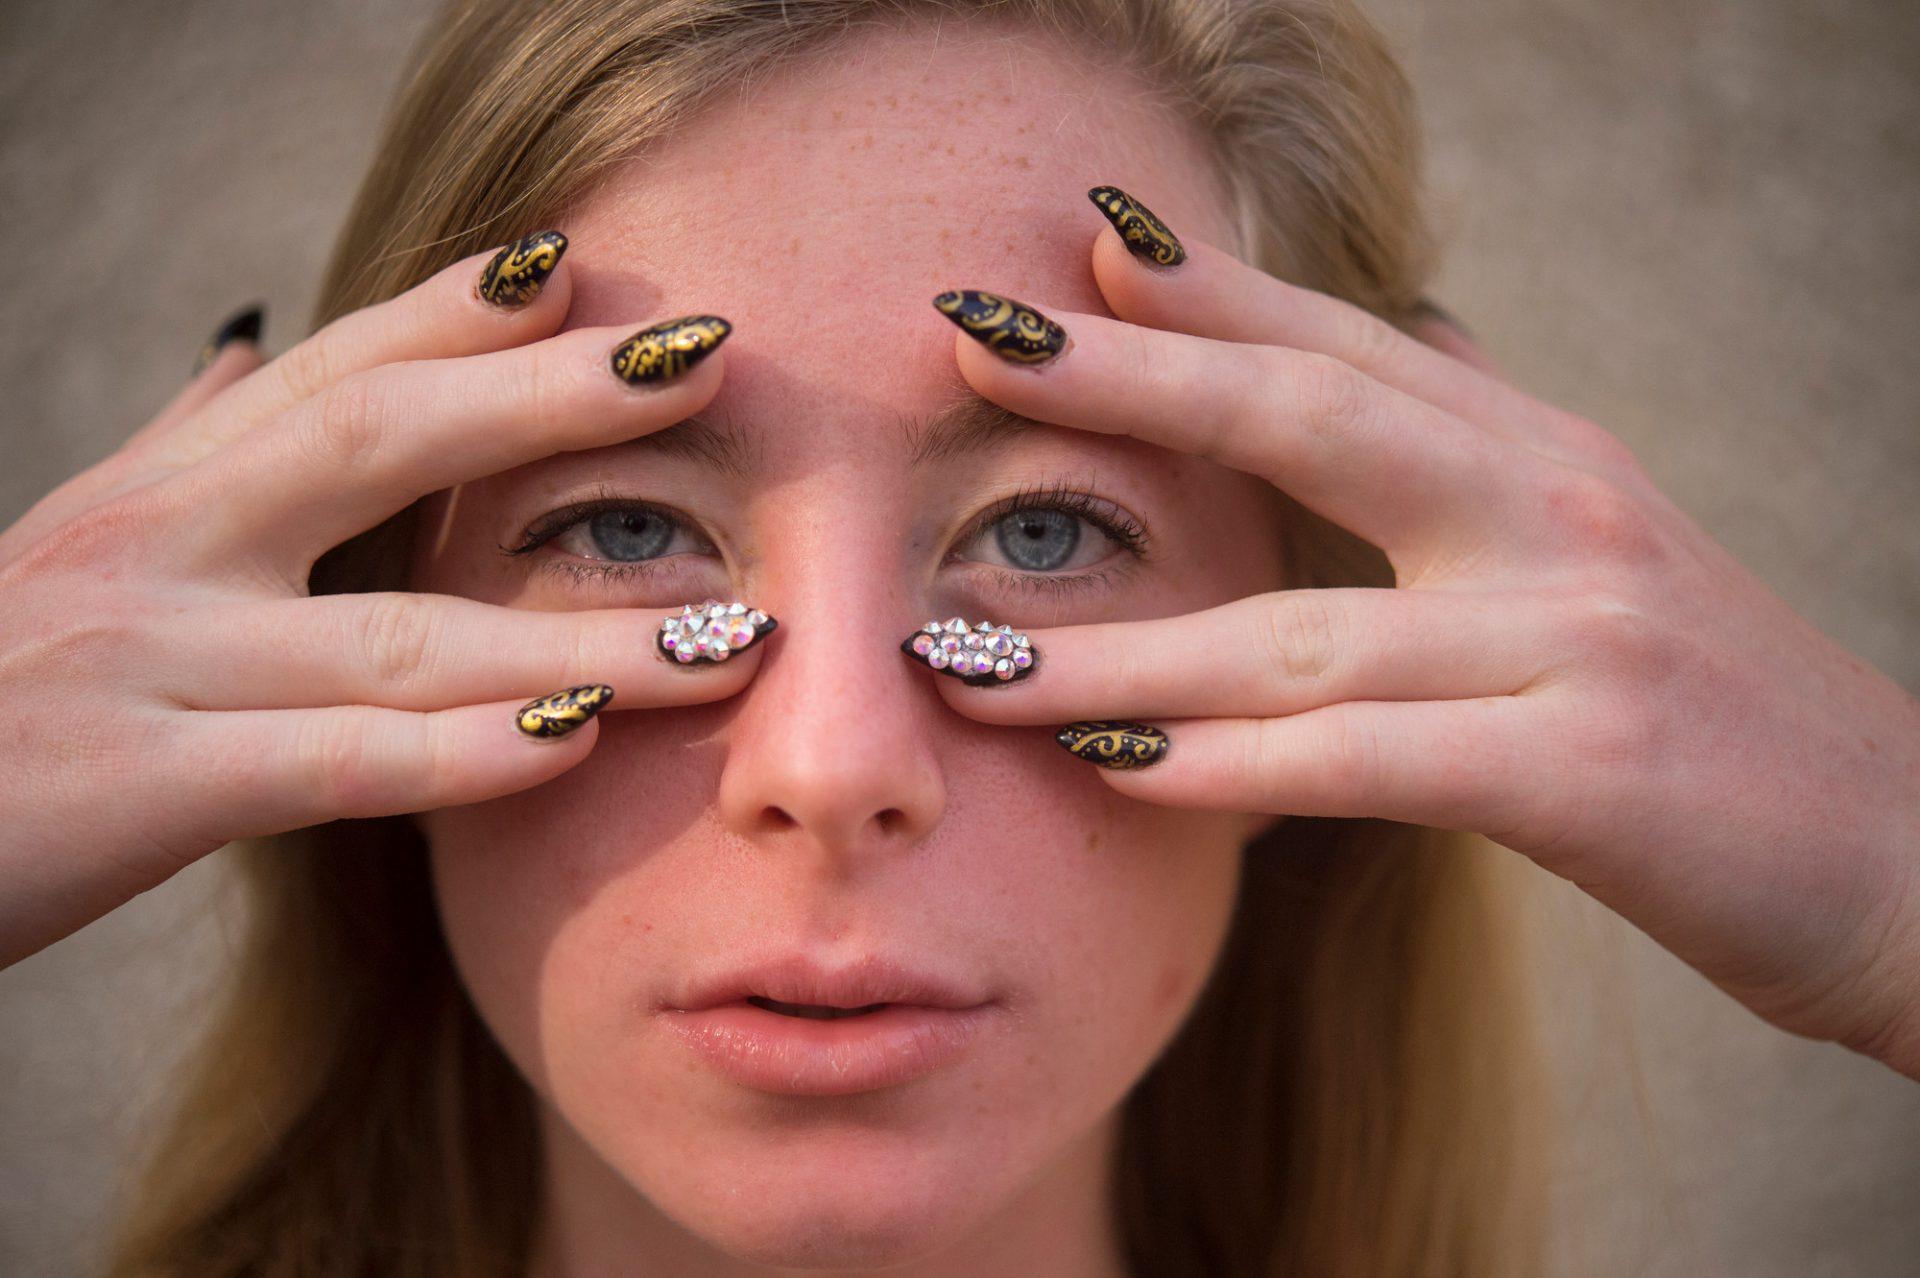 Photo: The fingernails of a teenage girl.